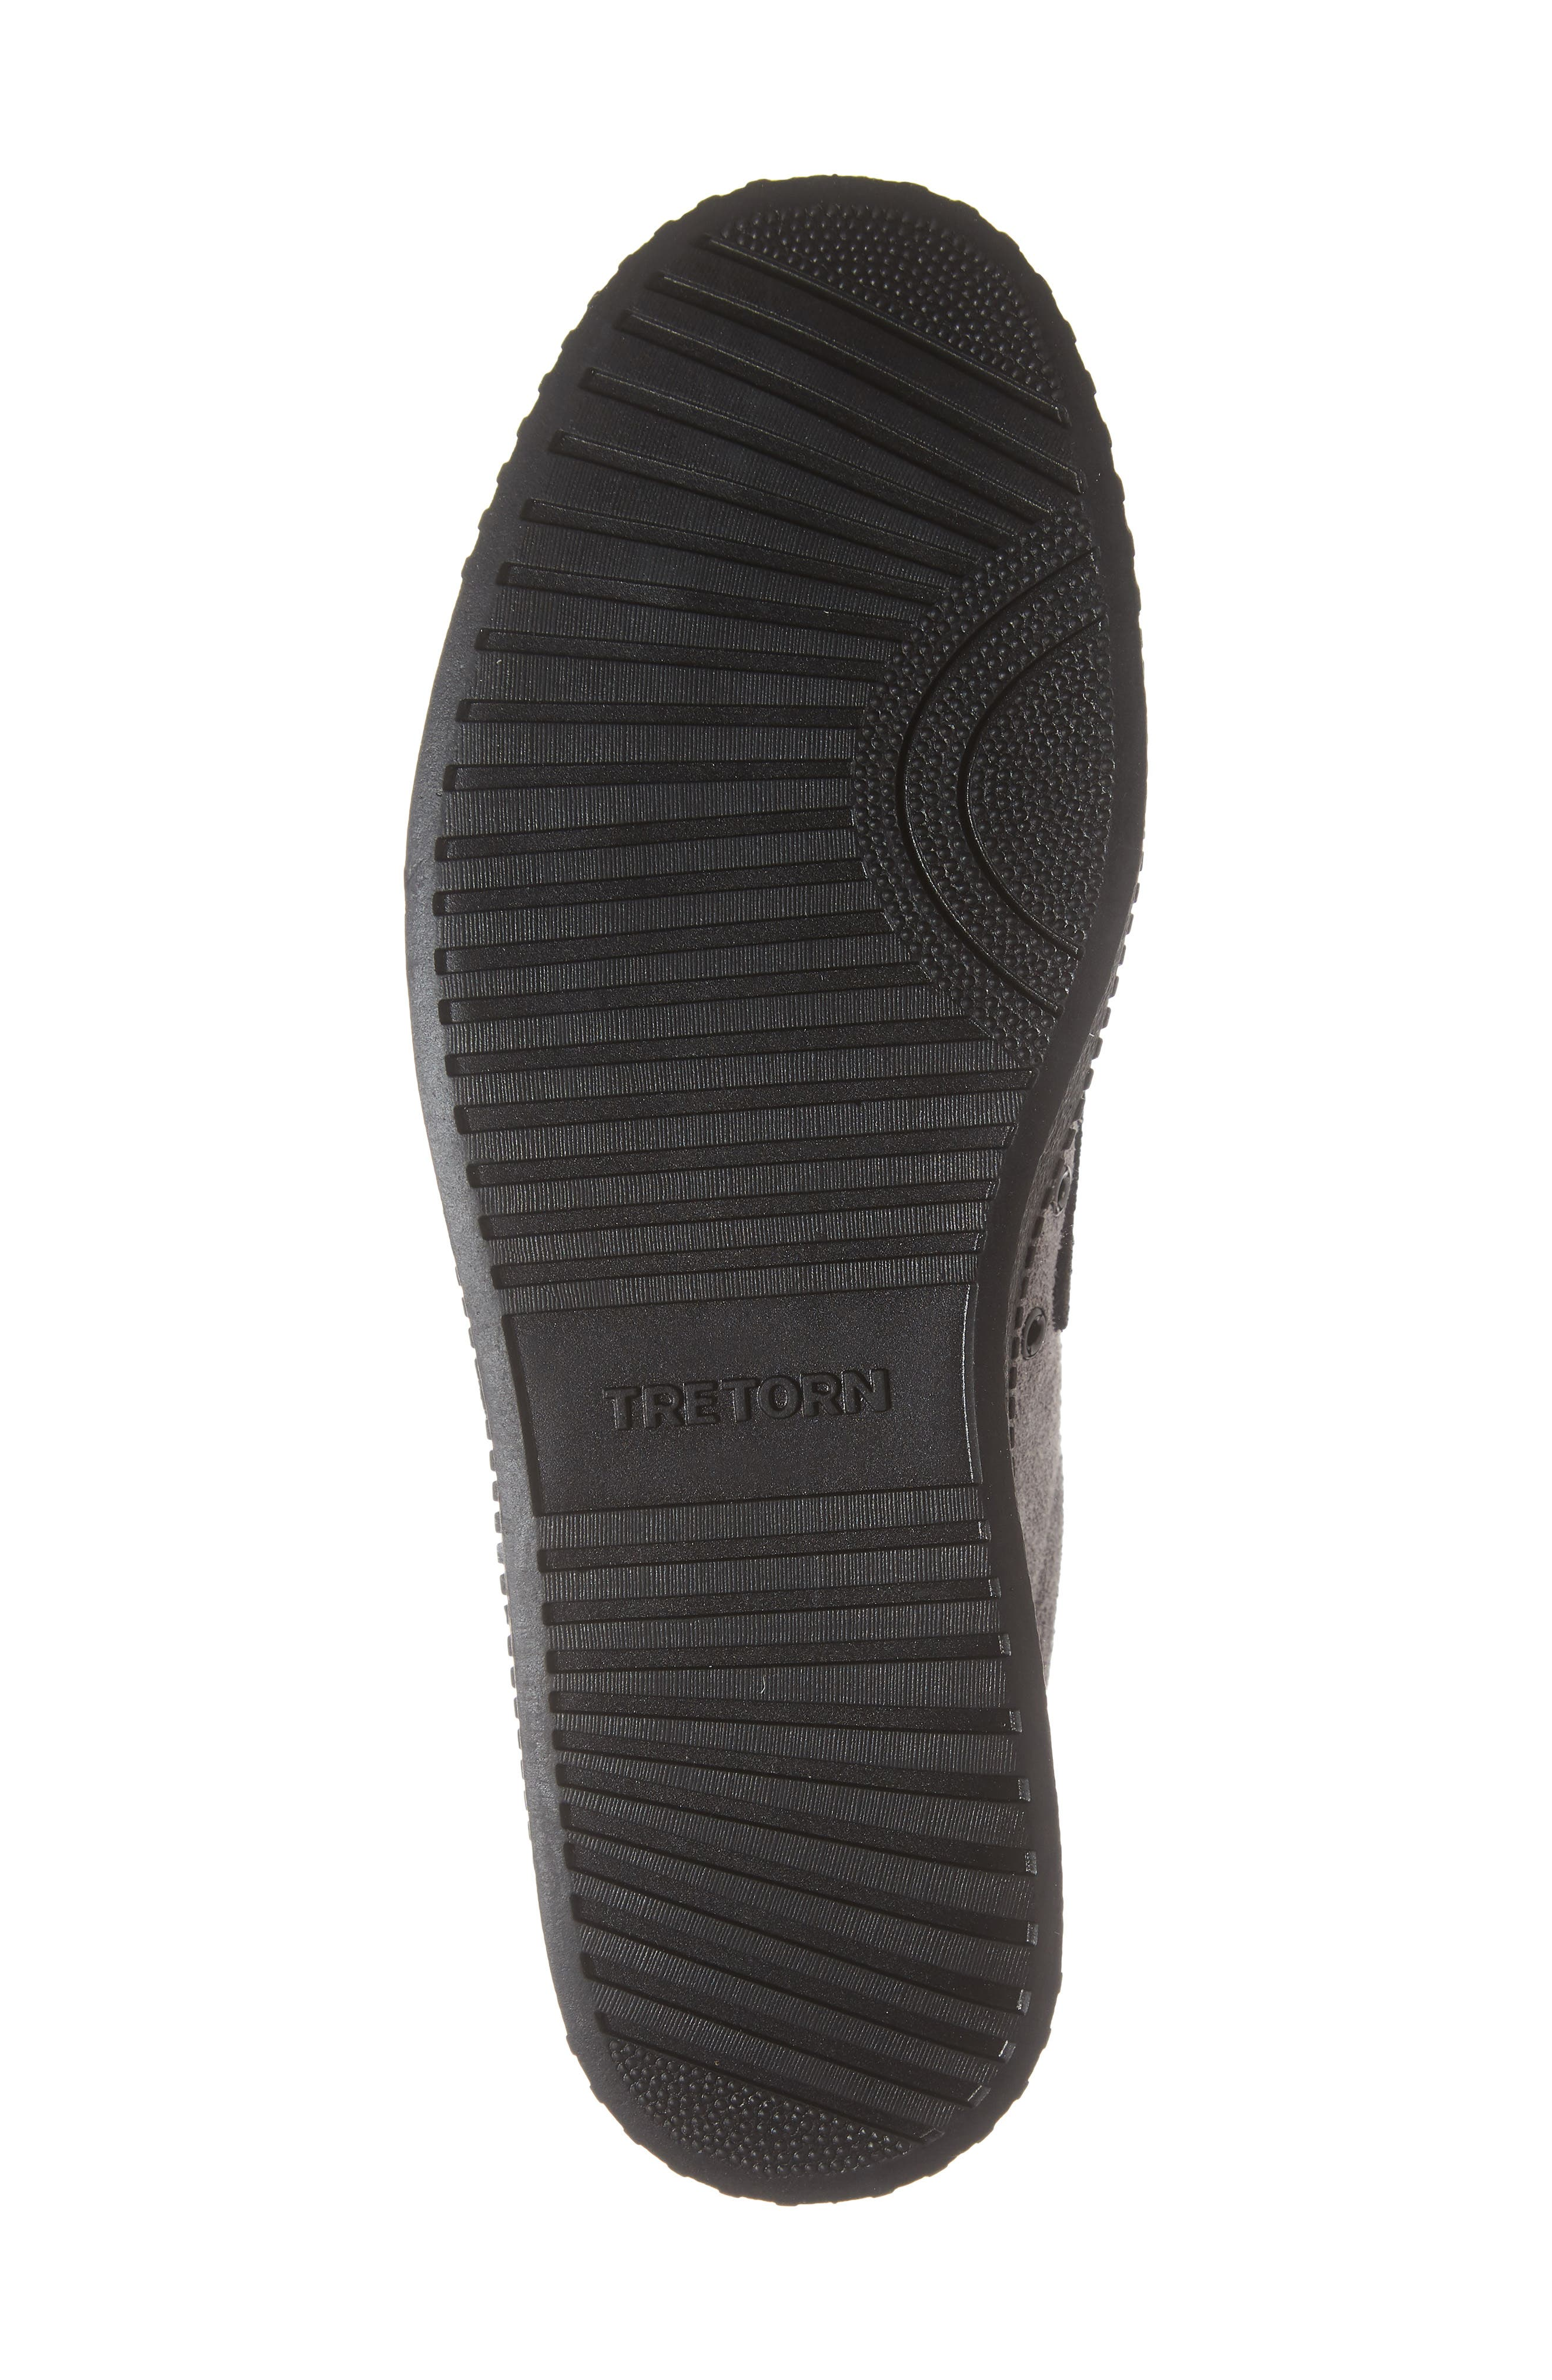 Nylite26Plus Sneaker,                             Alternate thumbnail 6, color,                             GRAPHITE SUEDE